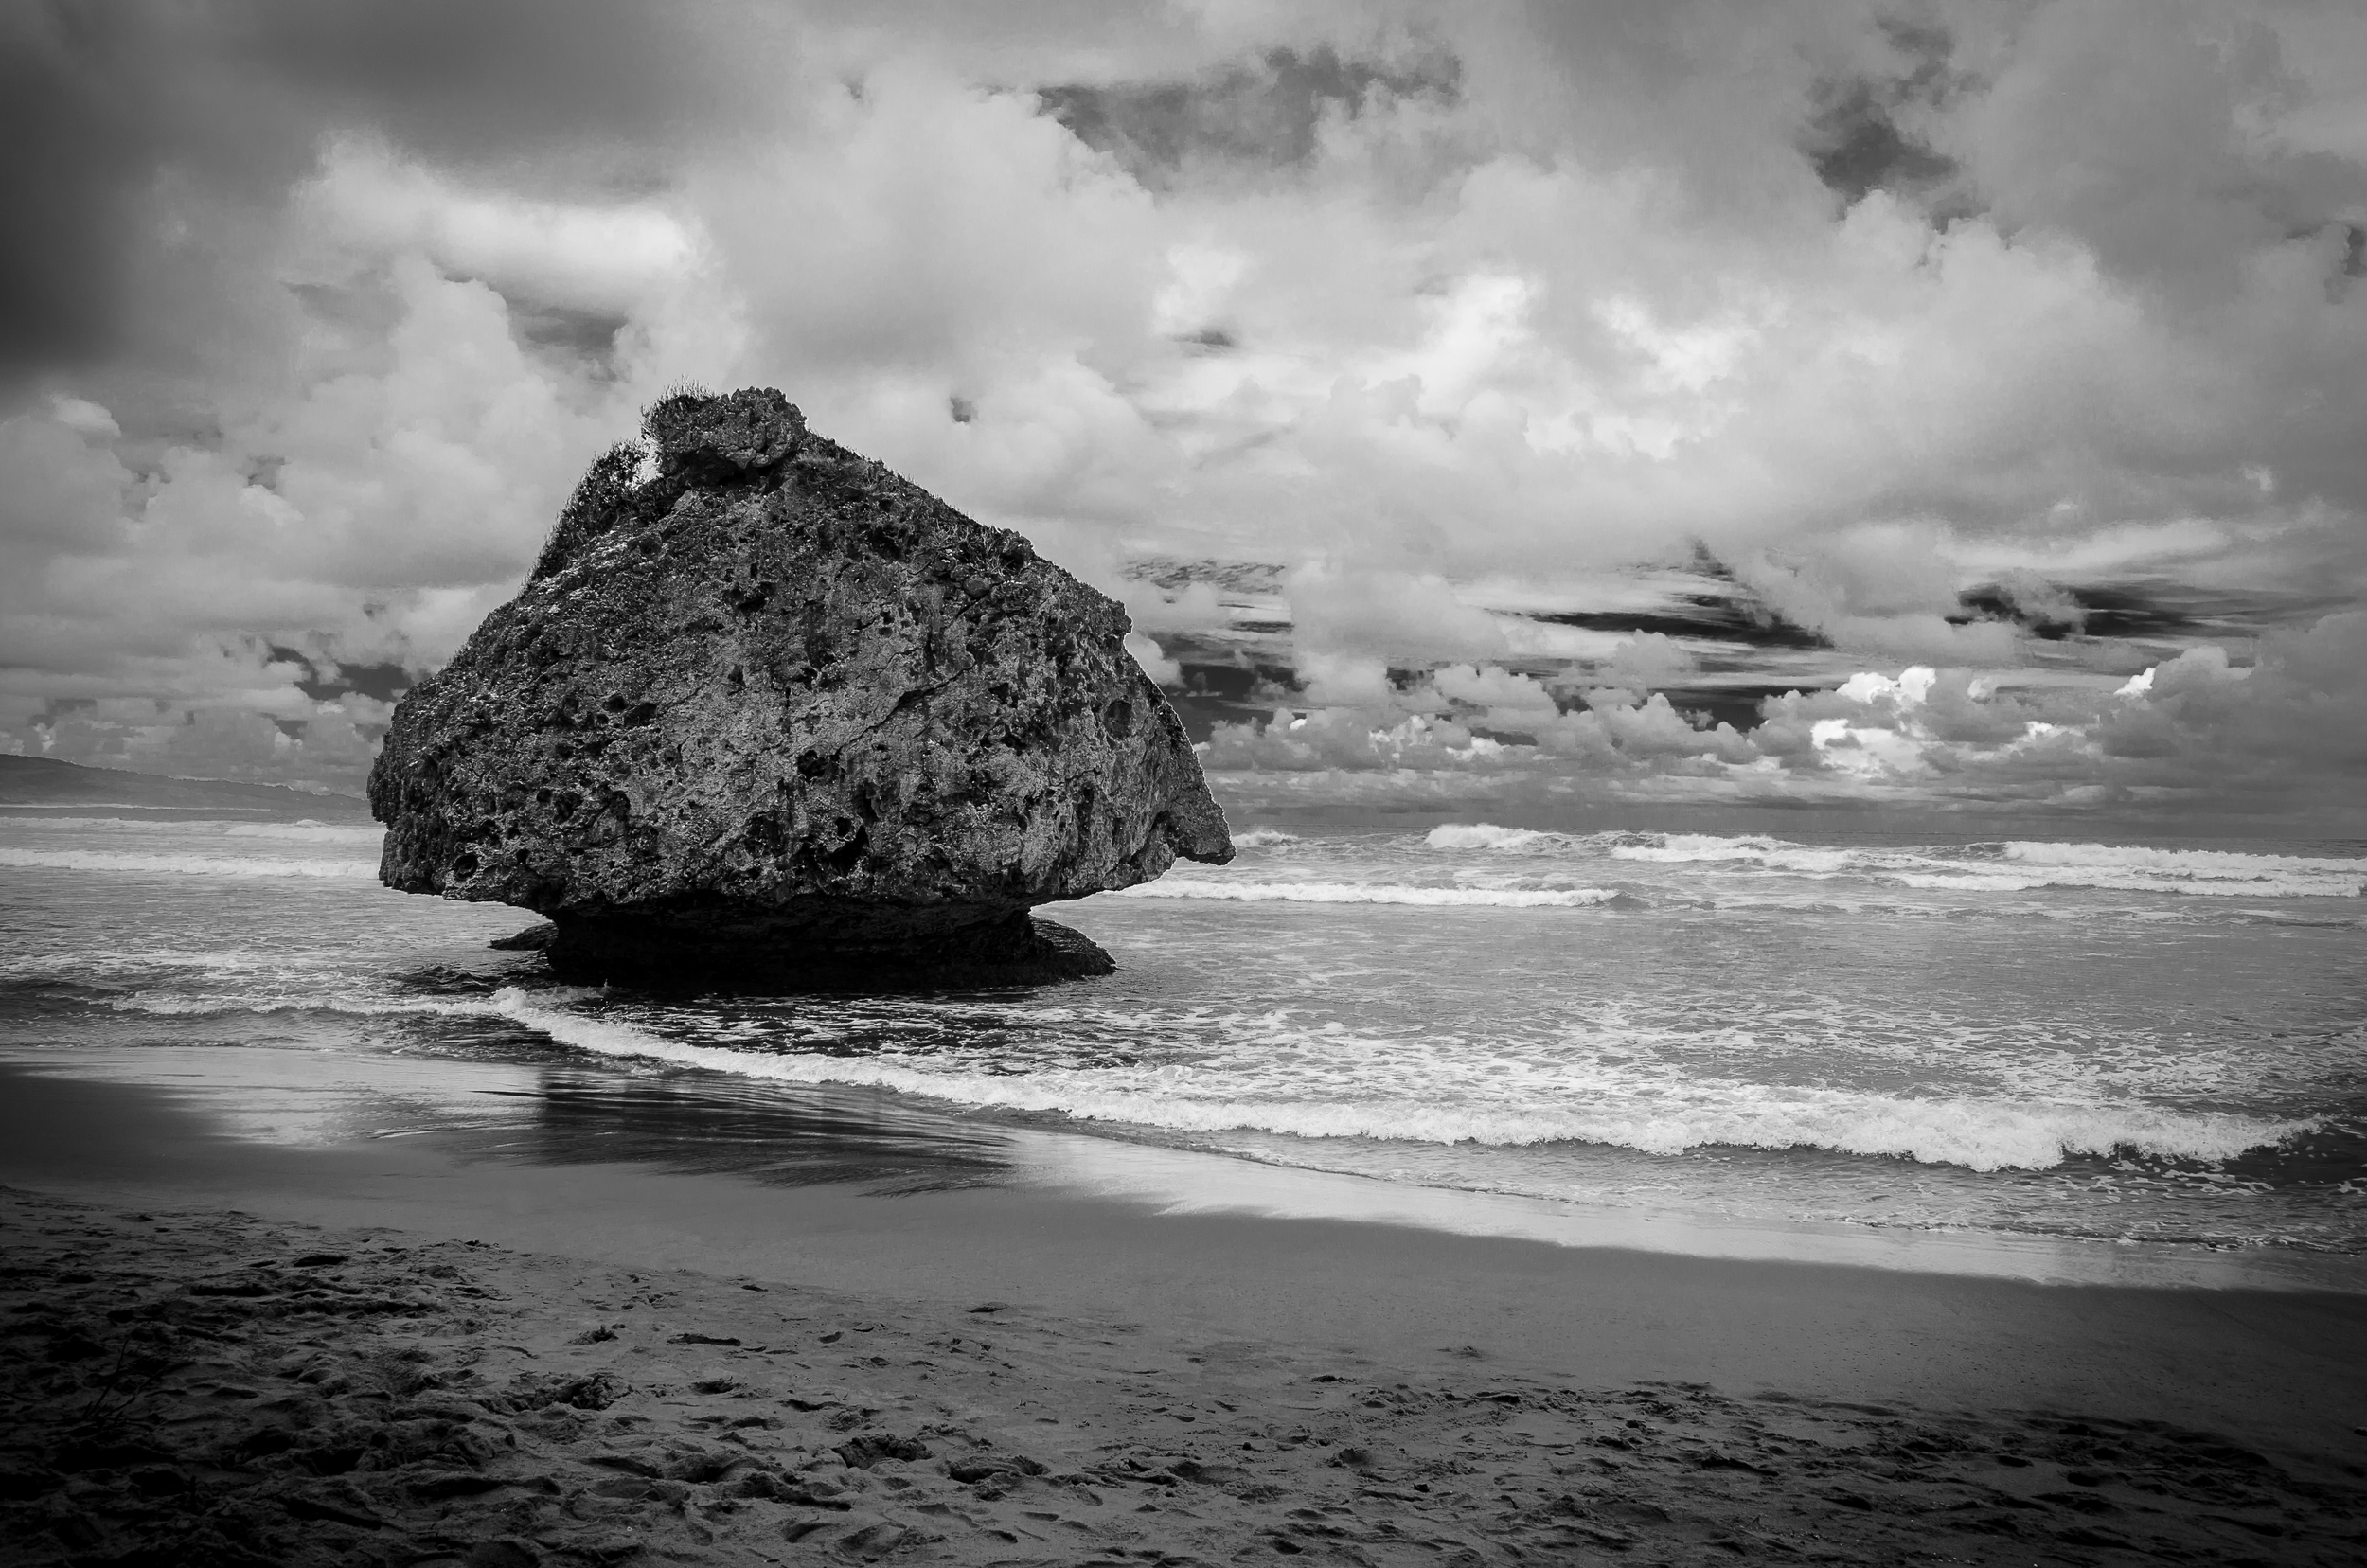 Mushroom shaped rocks on the beach at Bathsheba